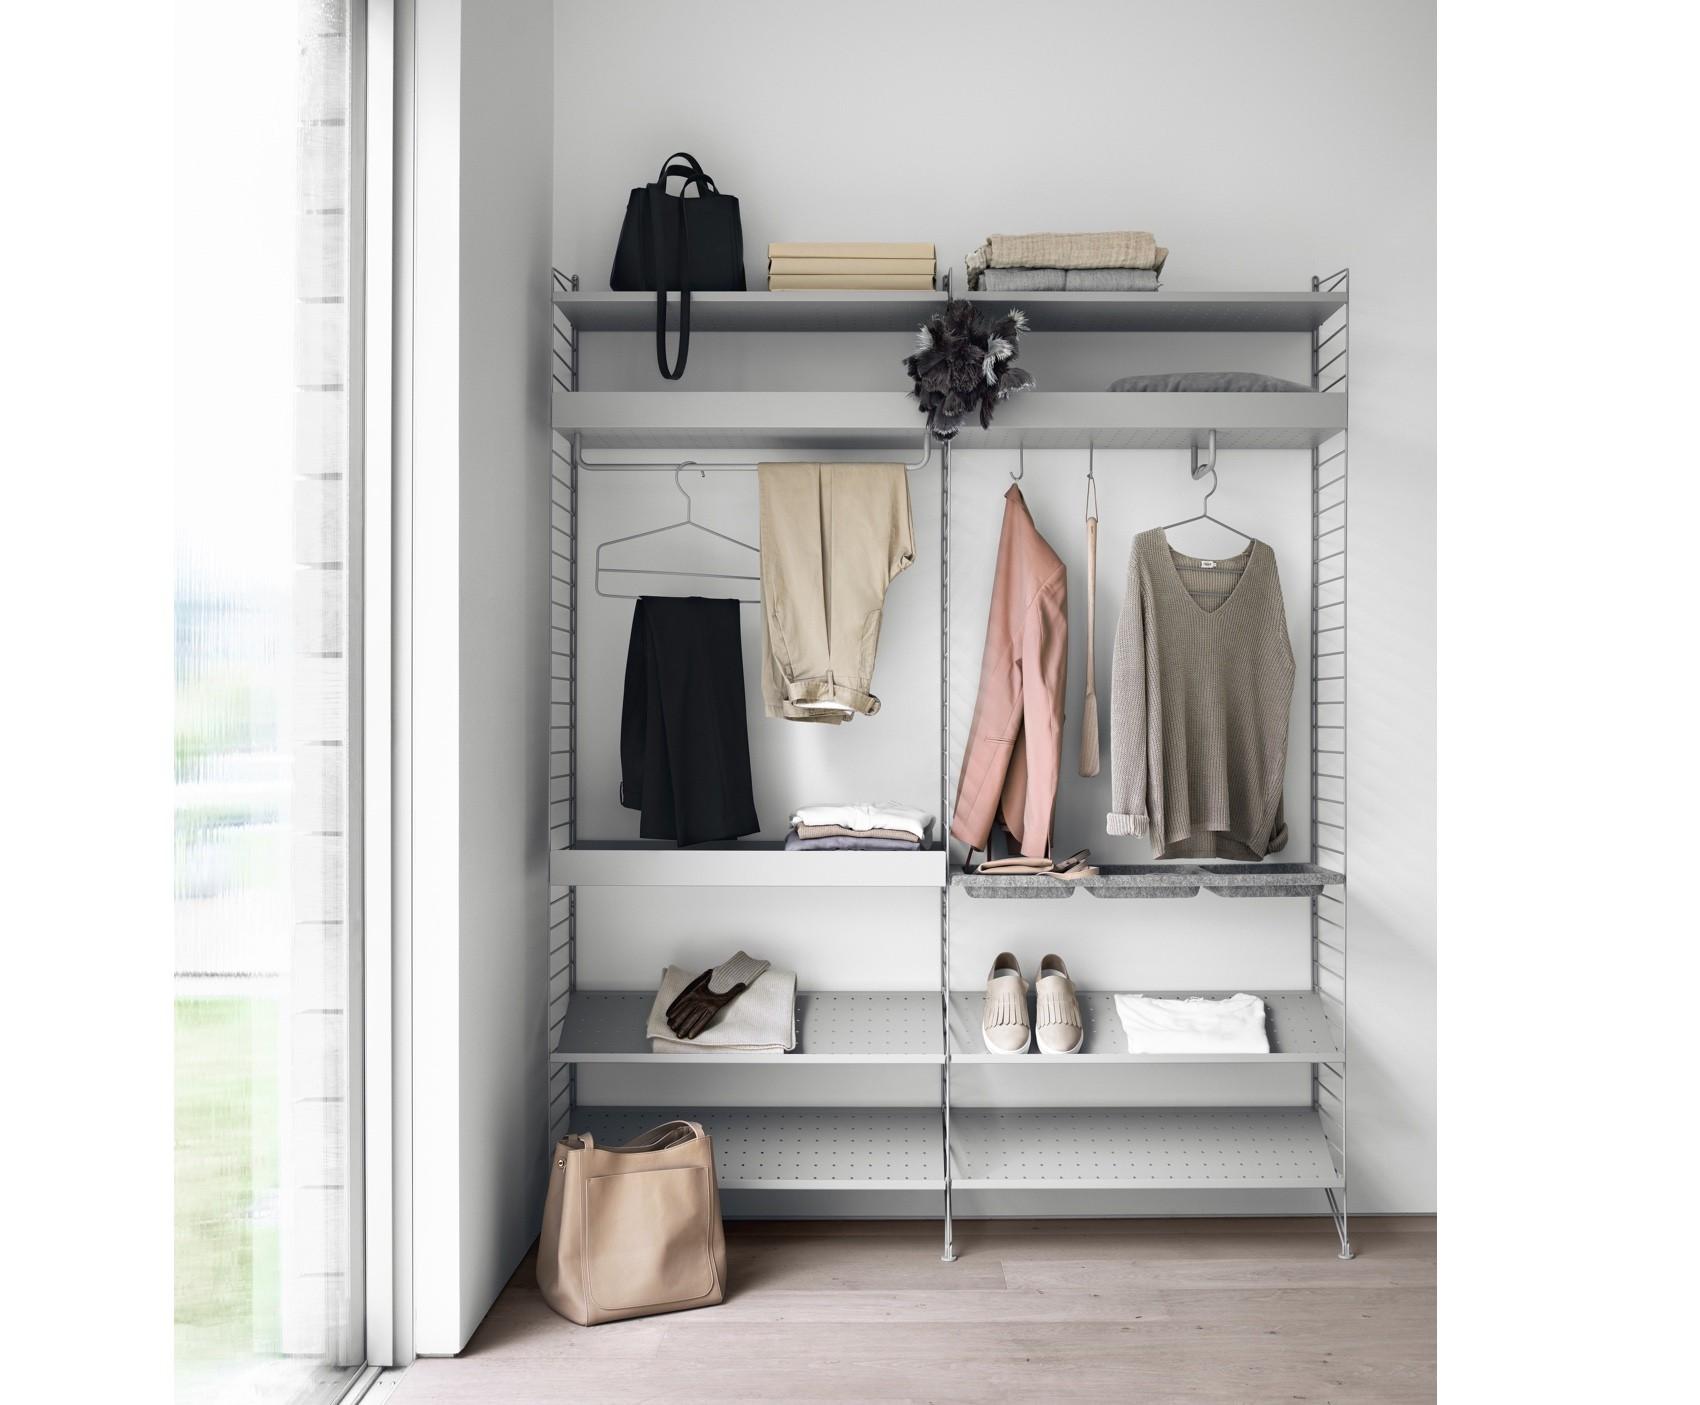 design depot systems closet diy martha closets tool stewart closetmaid simple system charming home